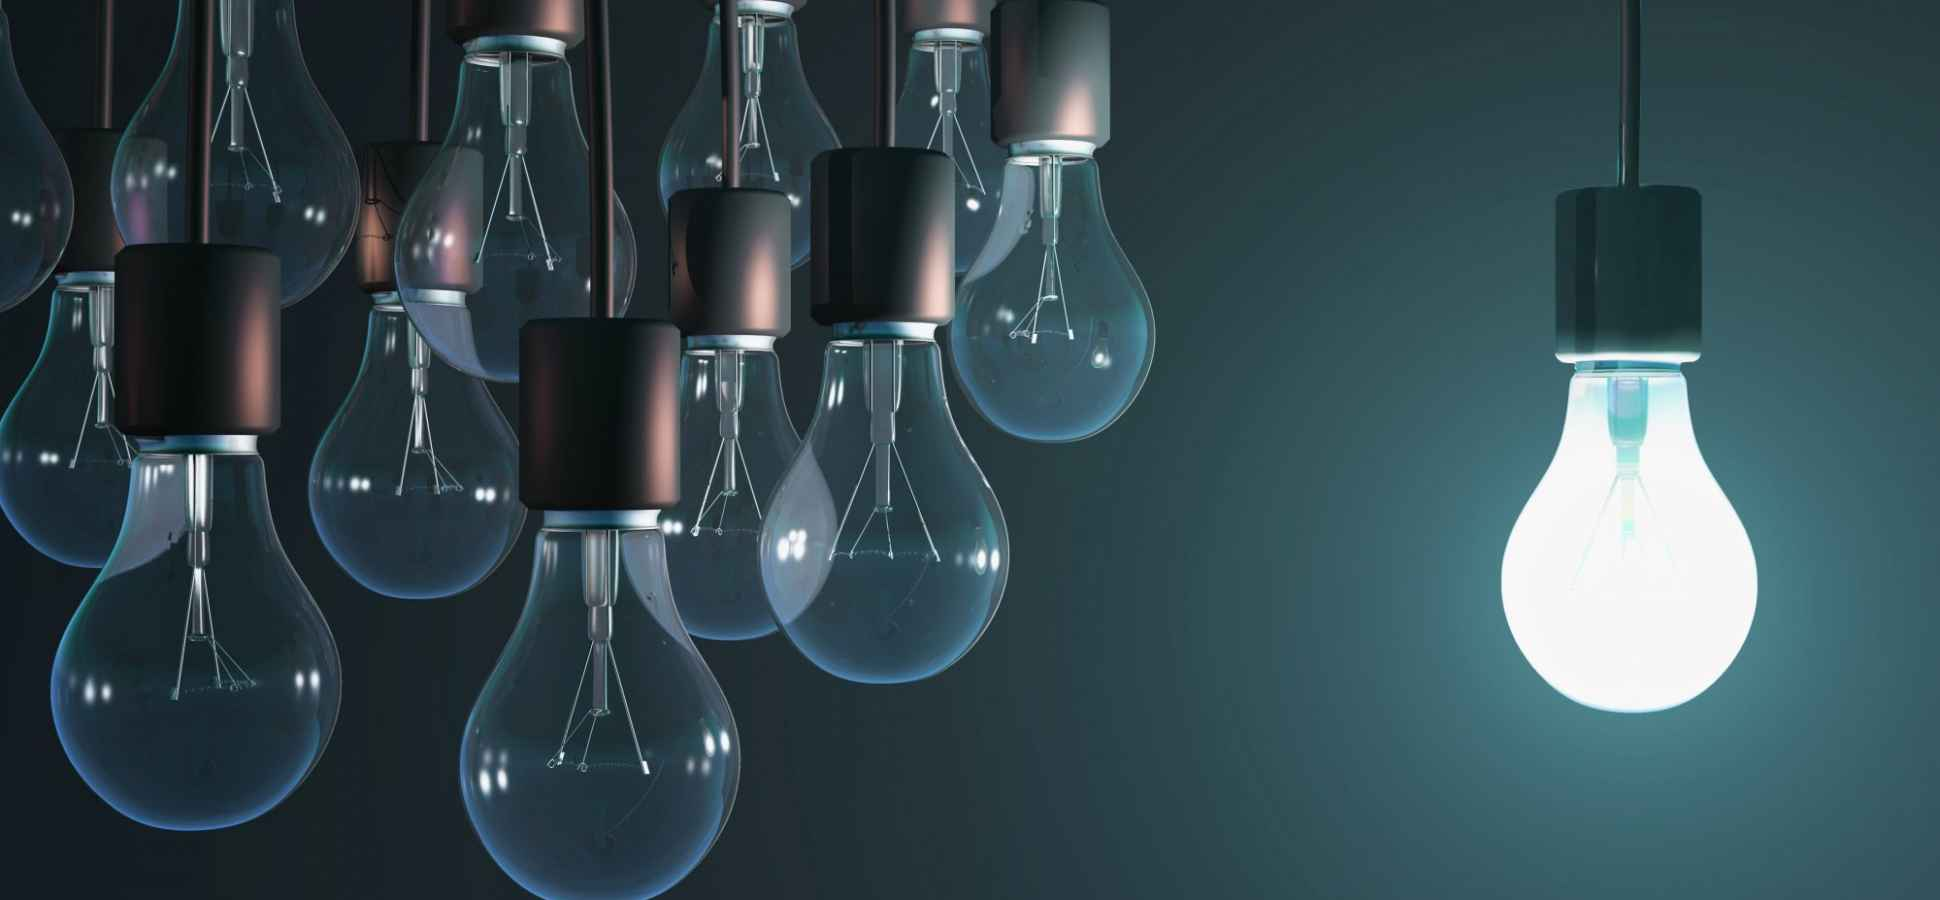 The 5 Skills and Behaviors That Make Entrepreneurs Successful, According to Harvard Research